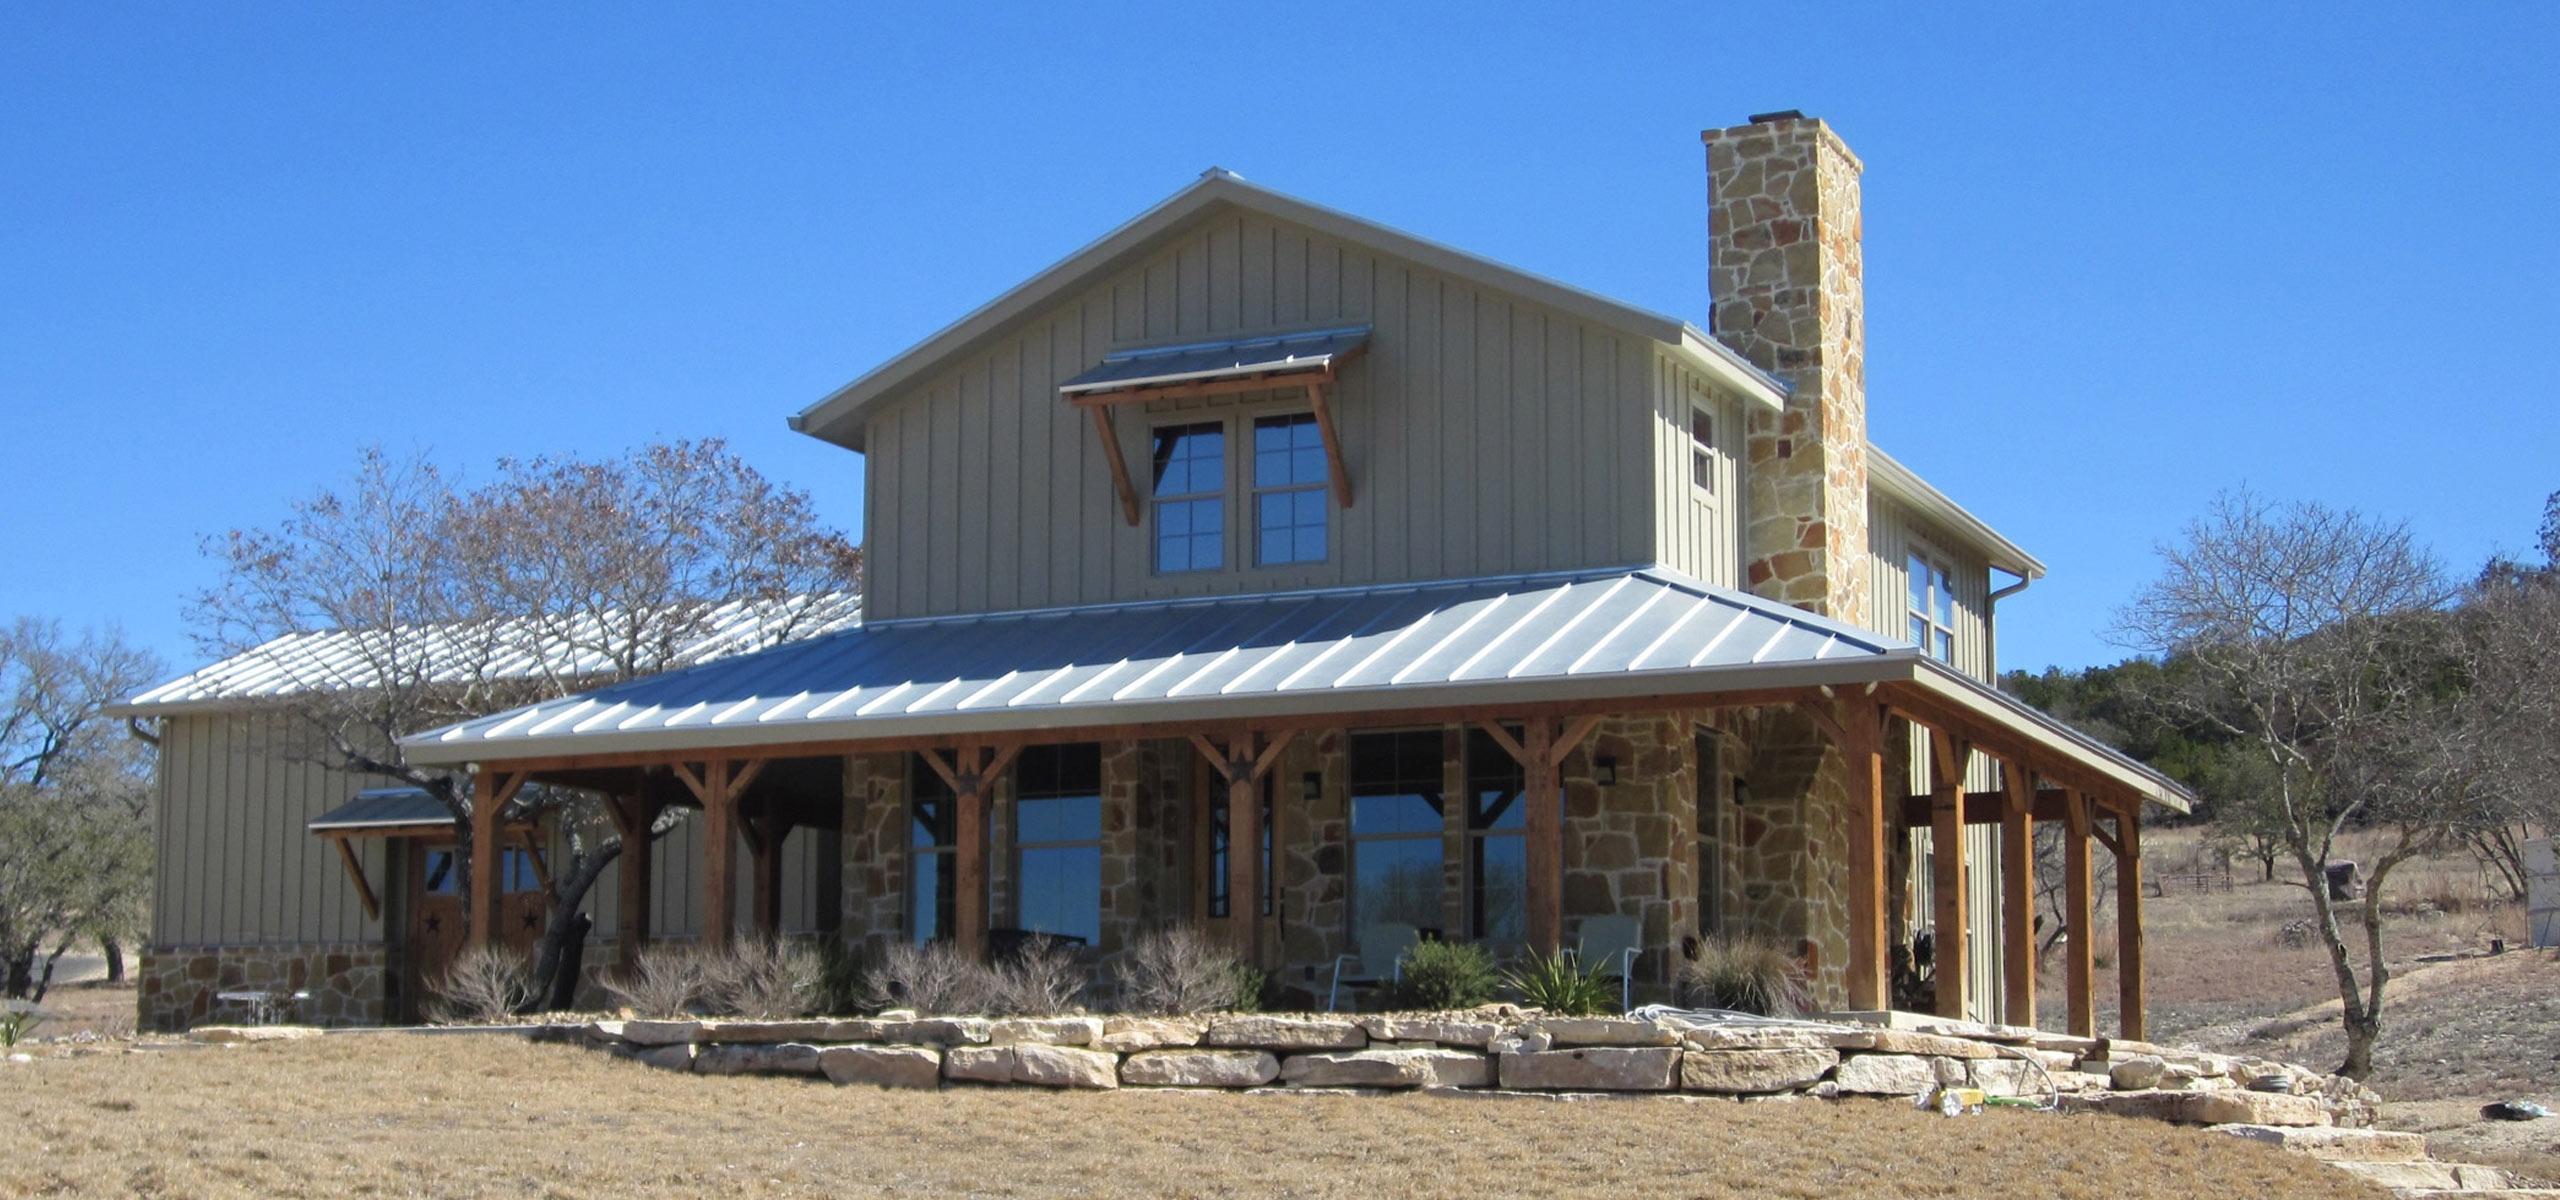 Texas Home Plans  Texas Home Plans